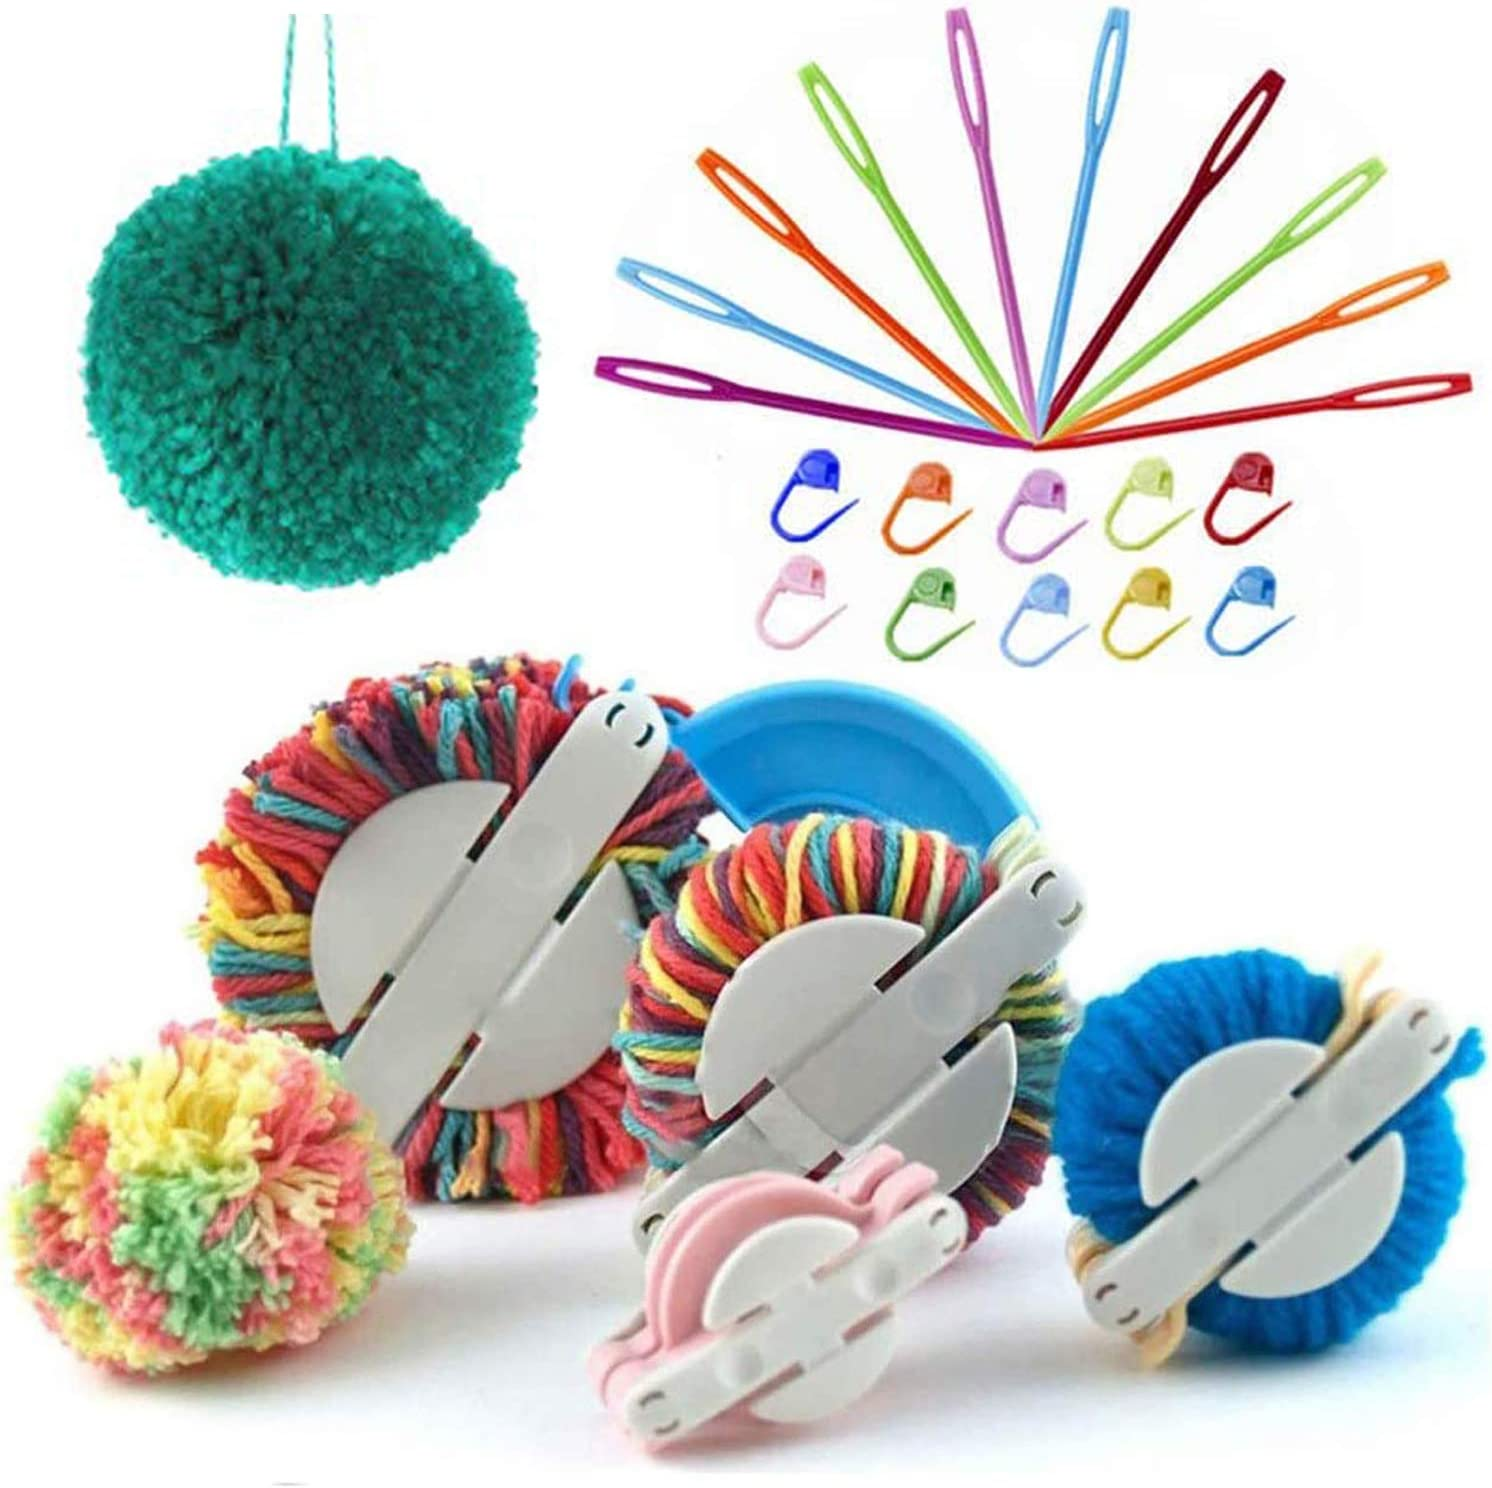 Pompom Maker Kit, 4 Sizes Pom pom Makers for Fluff Ball Weaver Needle Craft DIY Wool Knitting Craft Tool Set Decoration + 10 PCS Knitting Stitch Markers + 10 PCS Plastic Needles